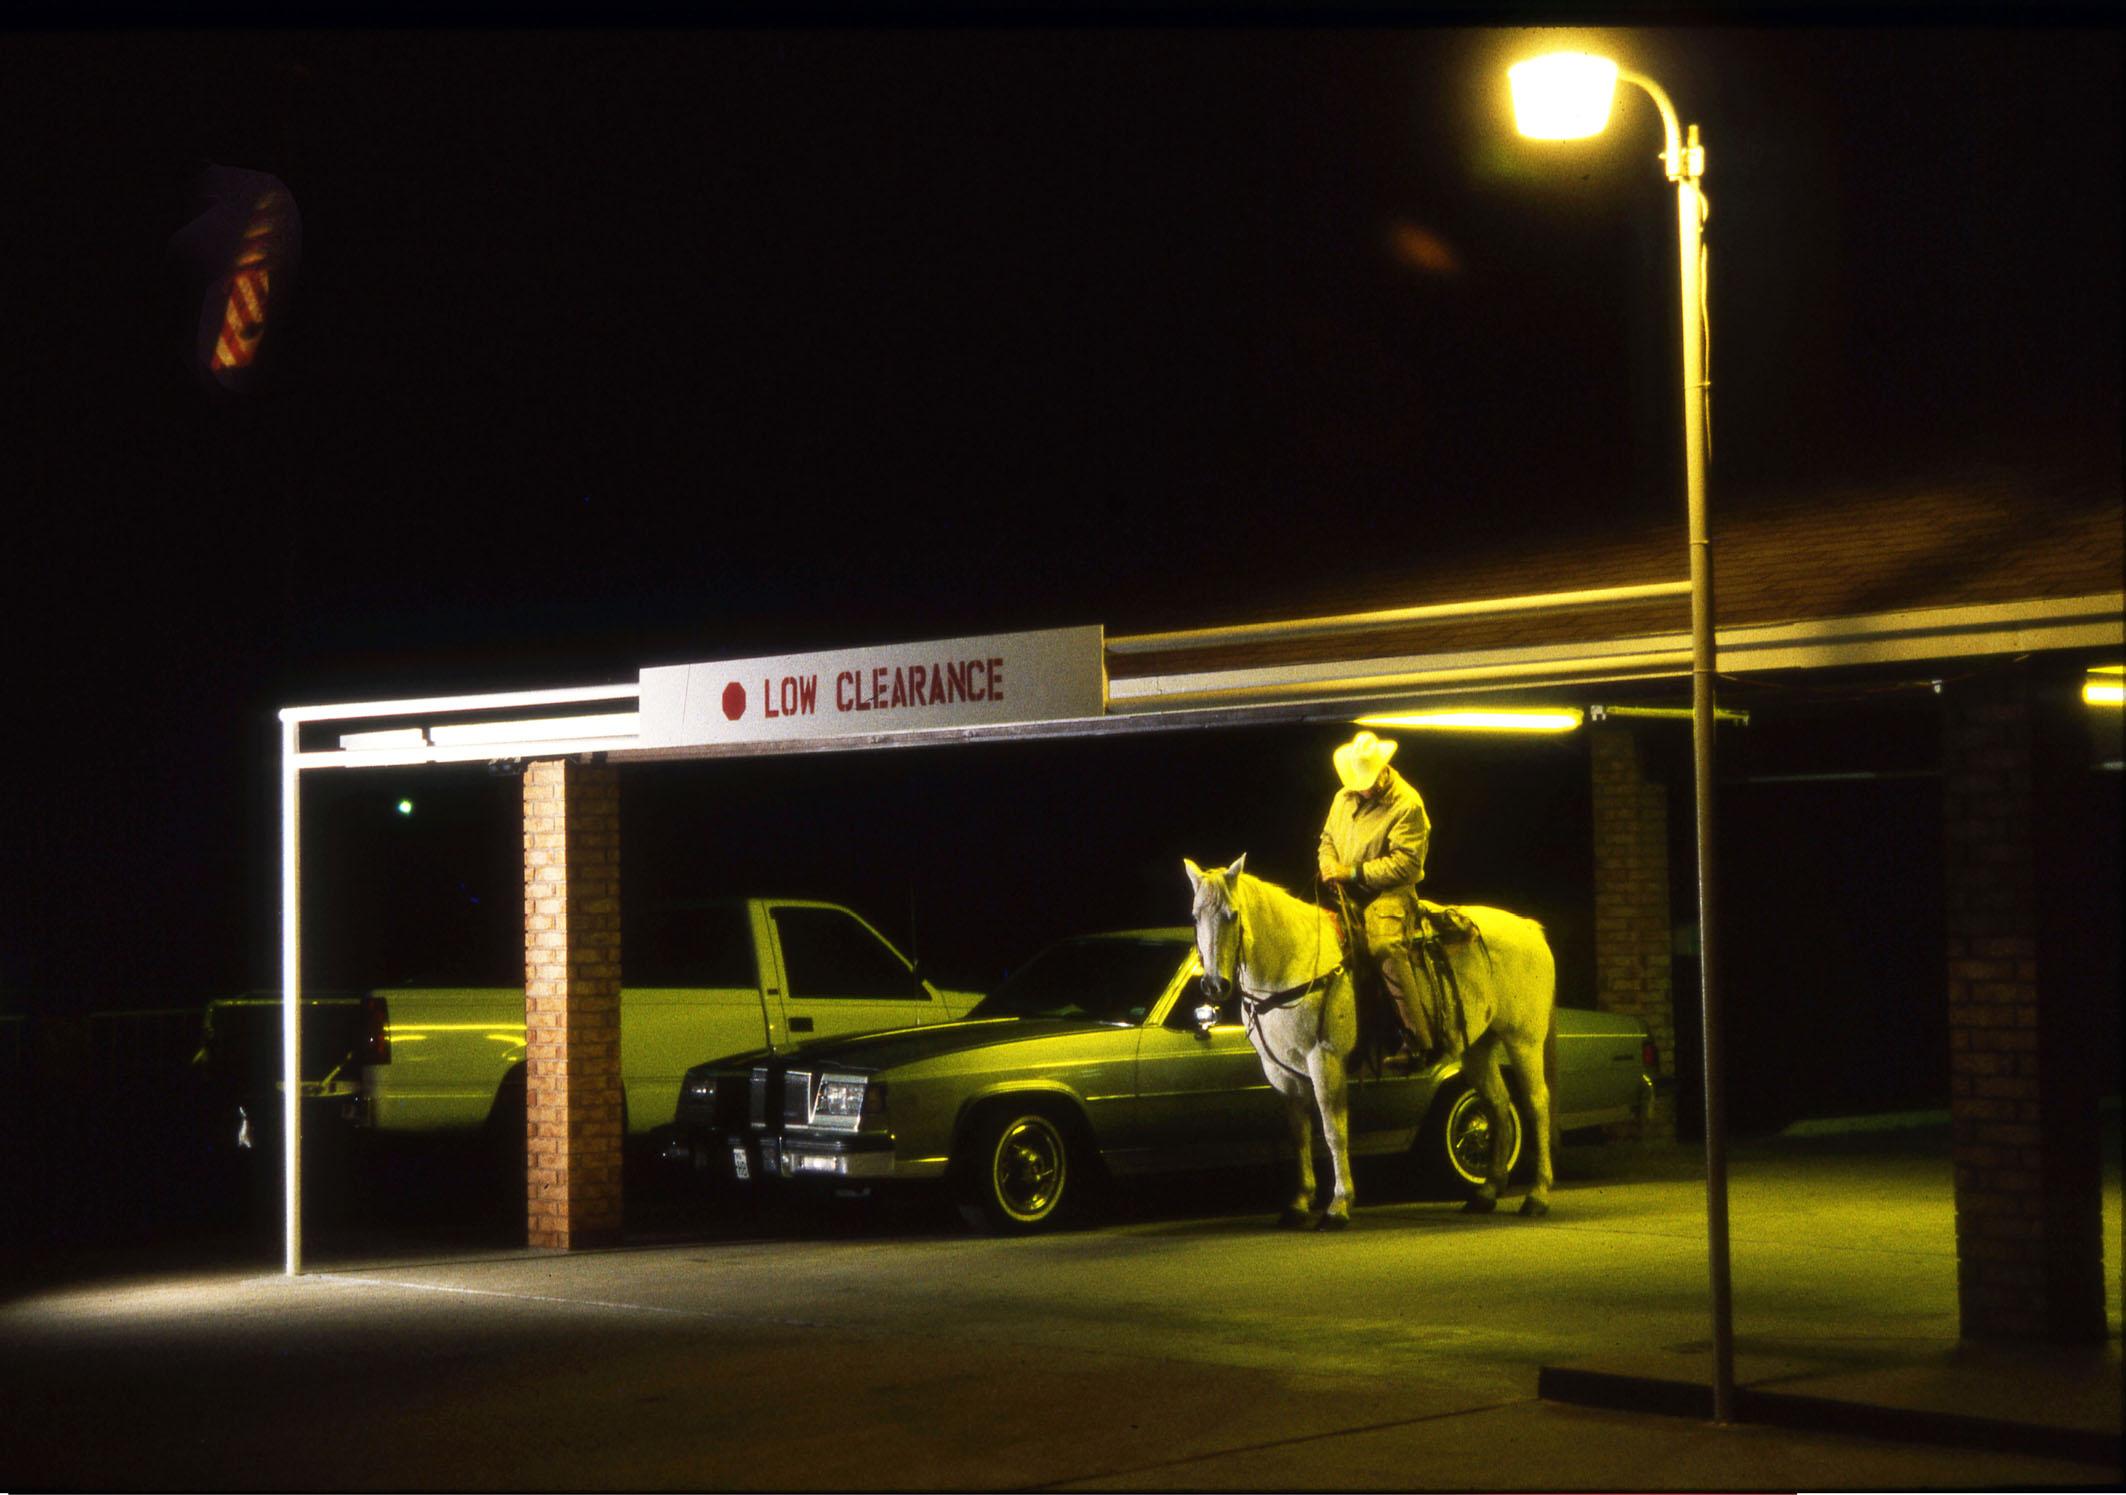 DieterBlum_LowClearance1 Texas 1992